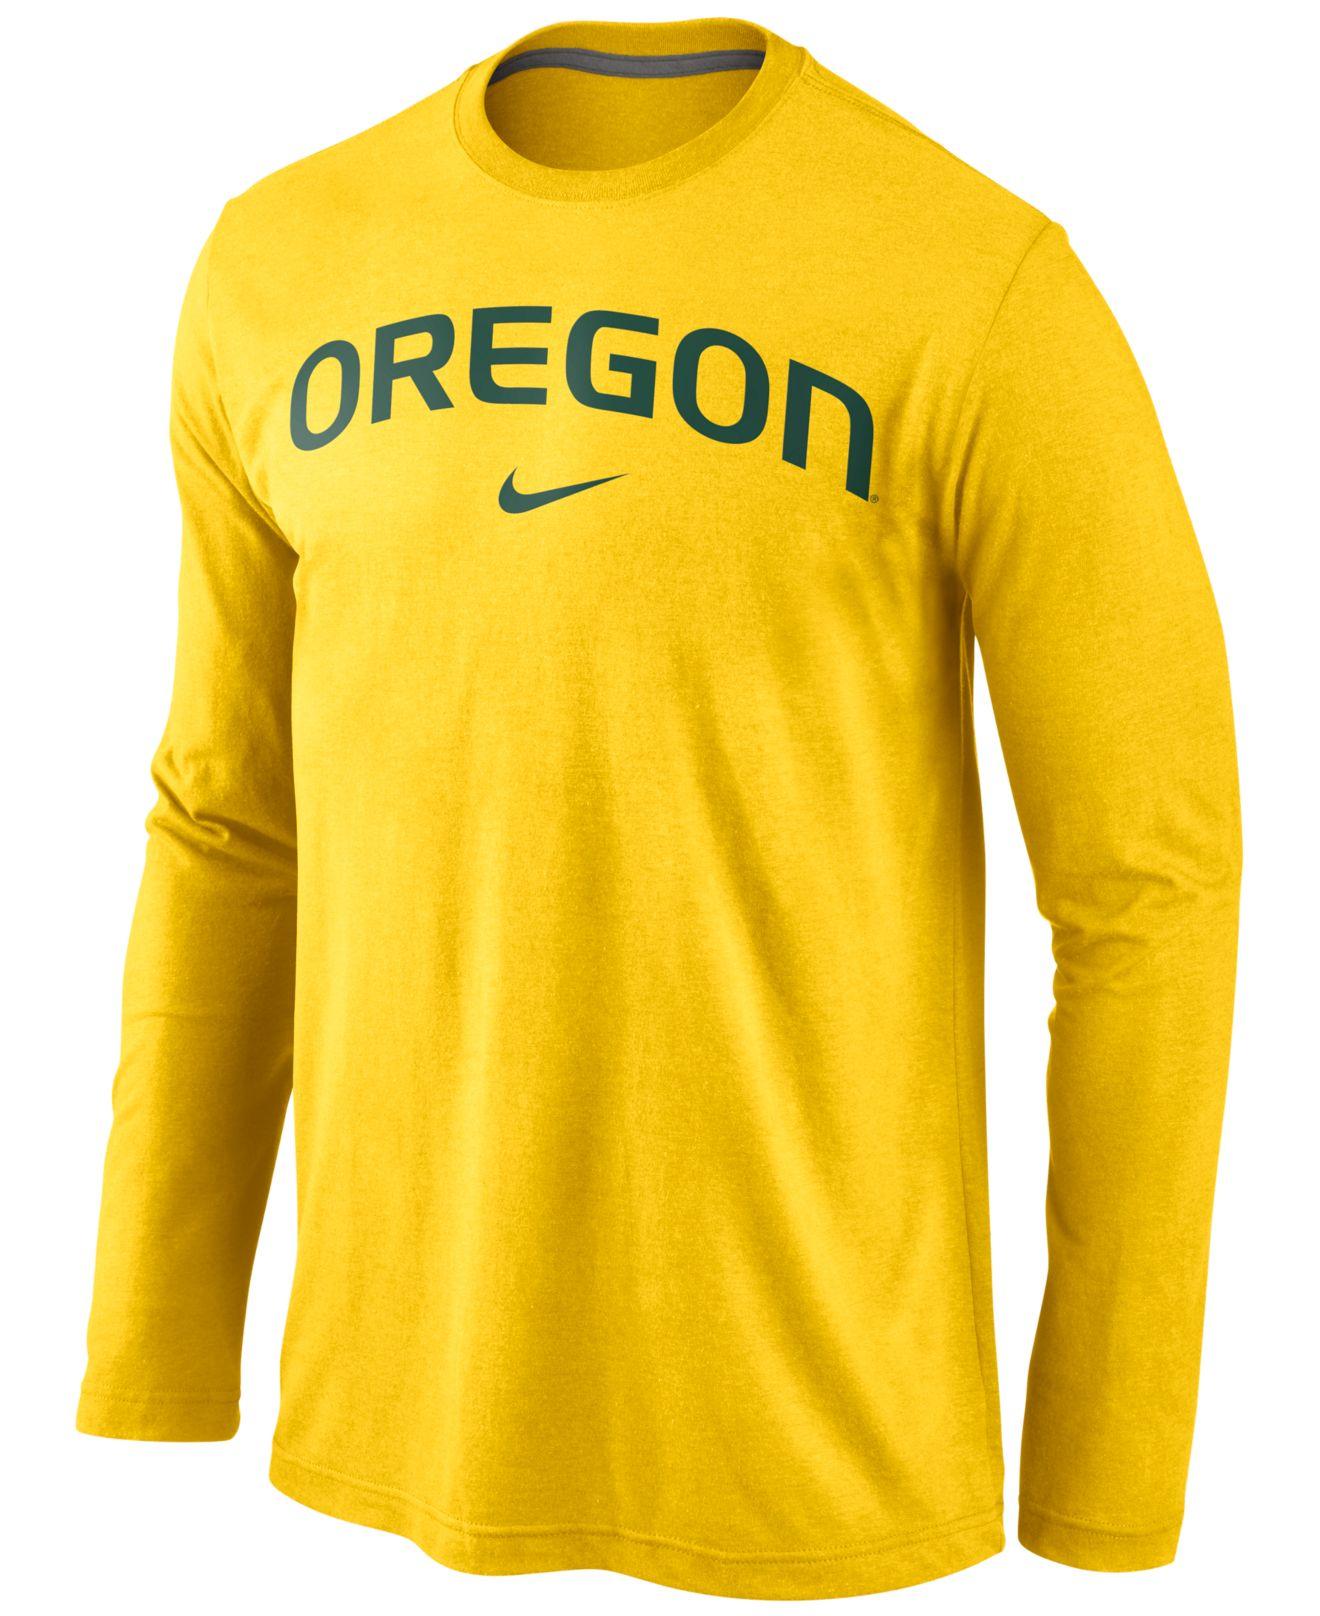 Nike Men'S Long-Sleeve Oregon Ducks Wordmark T-Shirt in Yellow for ...